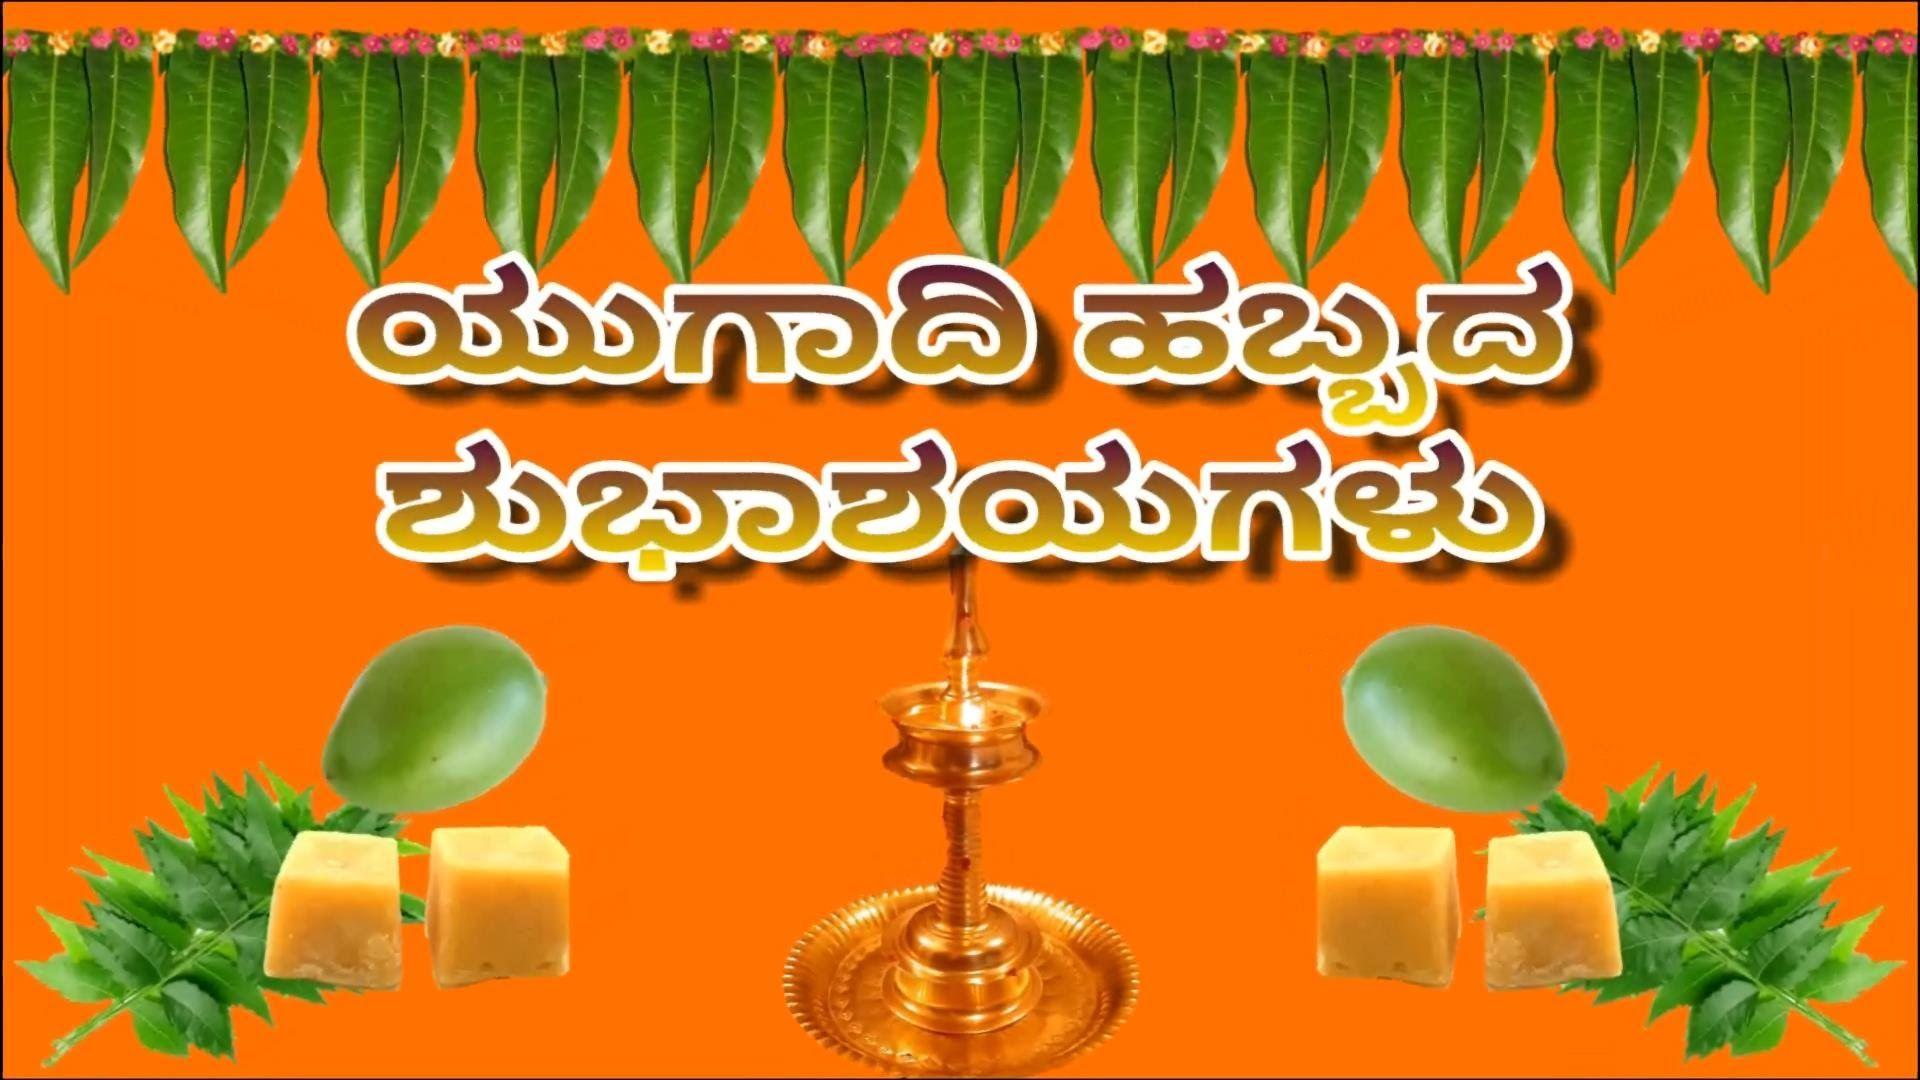 happy ugadi greetings in kannada kannada ugadi wishes ugadi whatsapp v